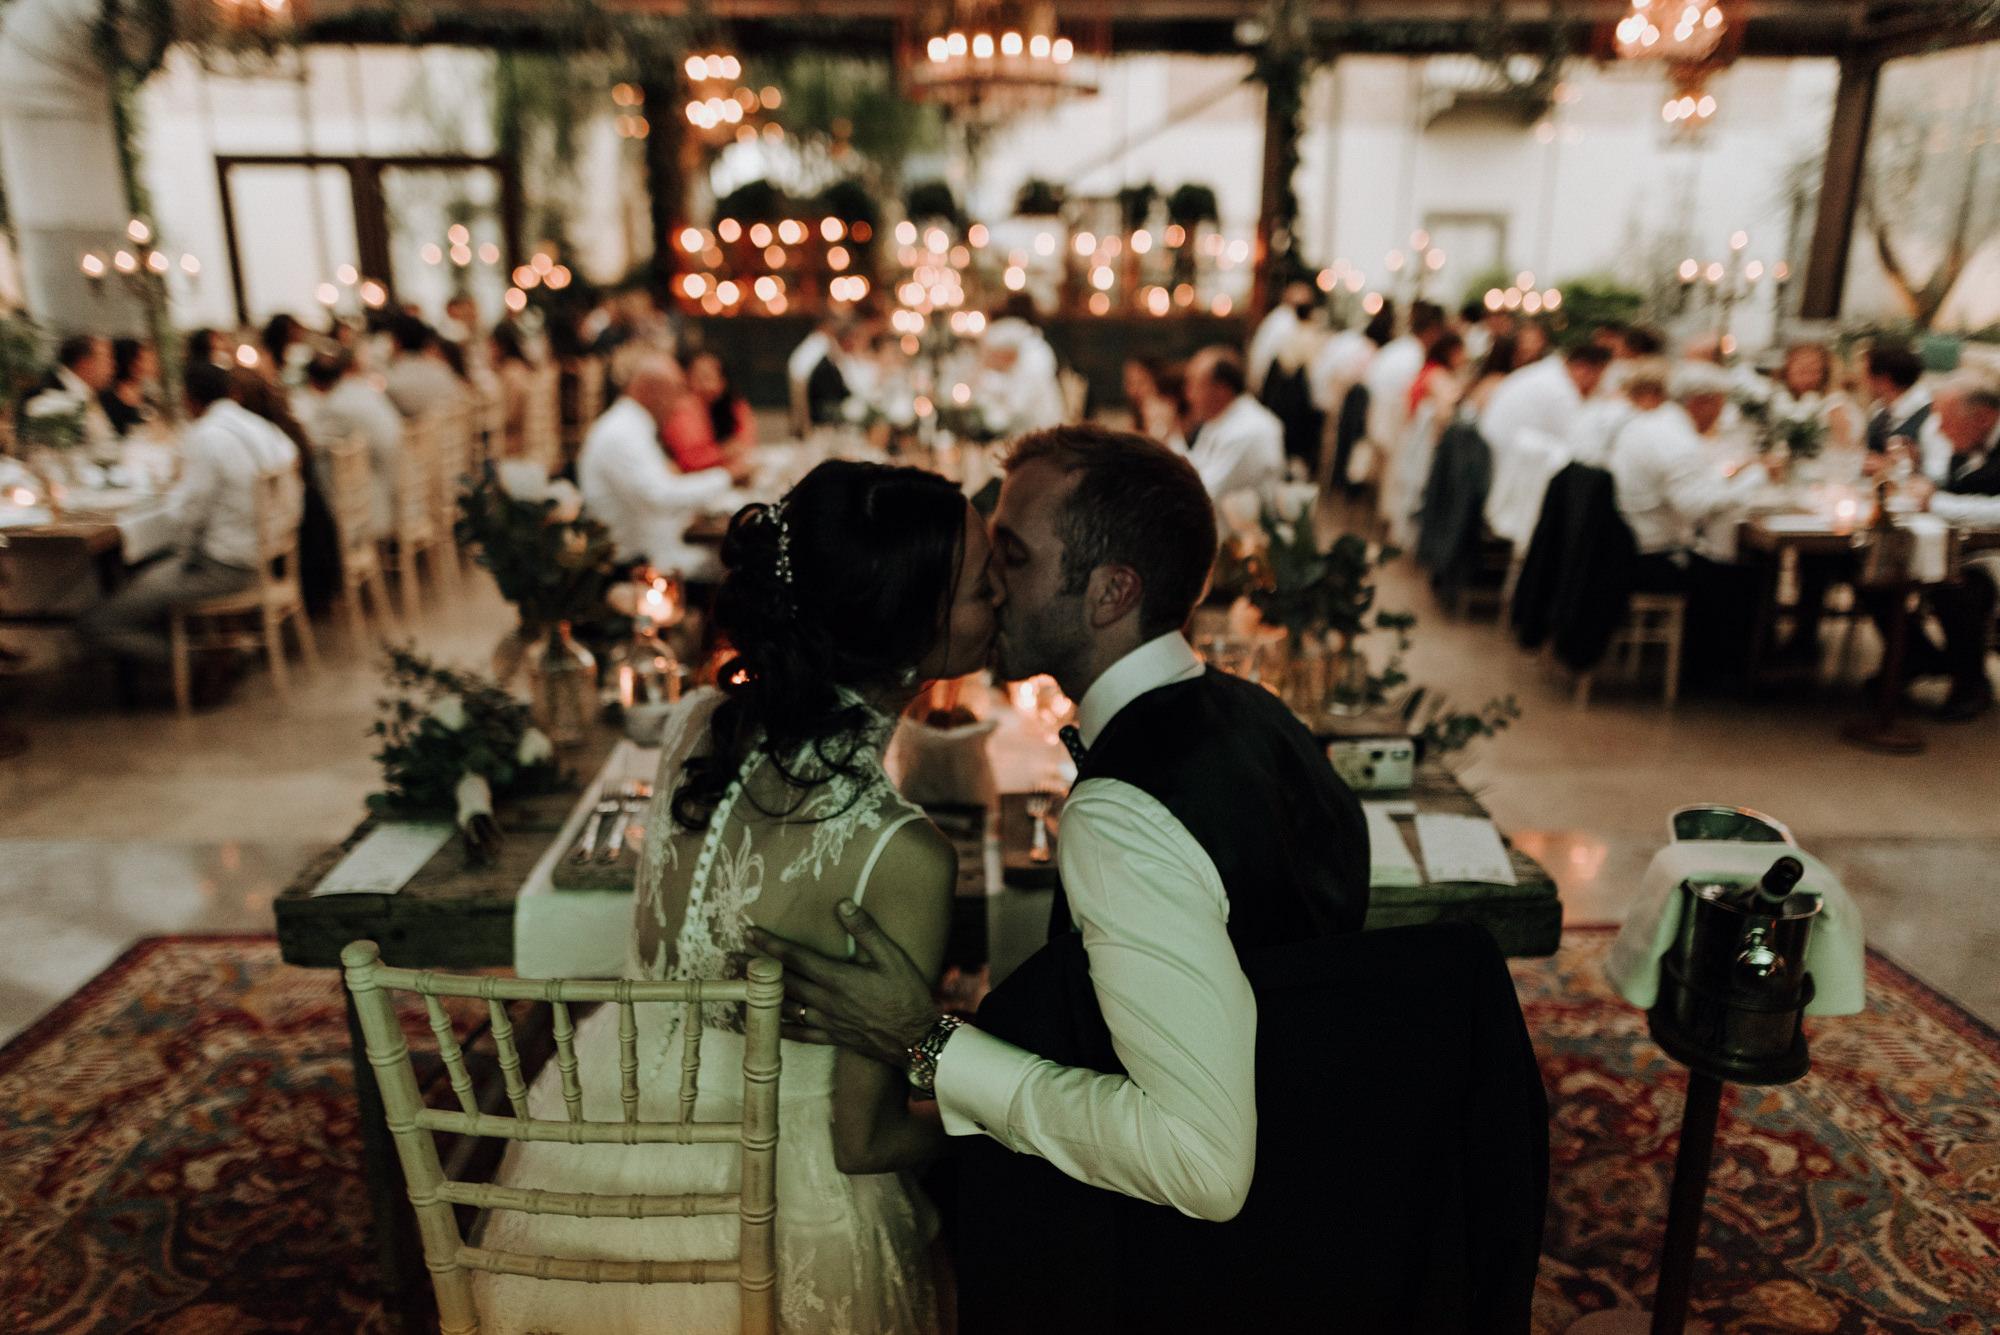 FOTO+PHOTO+BODA+WEDDING+ITALIA+ITALY+MAURICIO+GARAY+MAURICIOGARAY+WEDDINPHOTOGRAPHER+FOTOGRAFODEBODA-1709.jpg